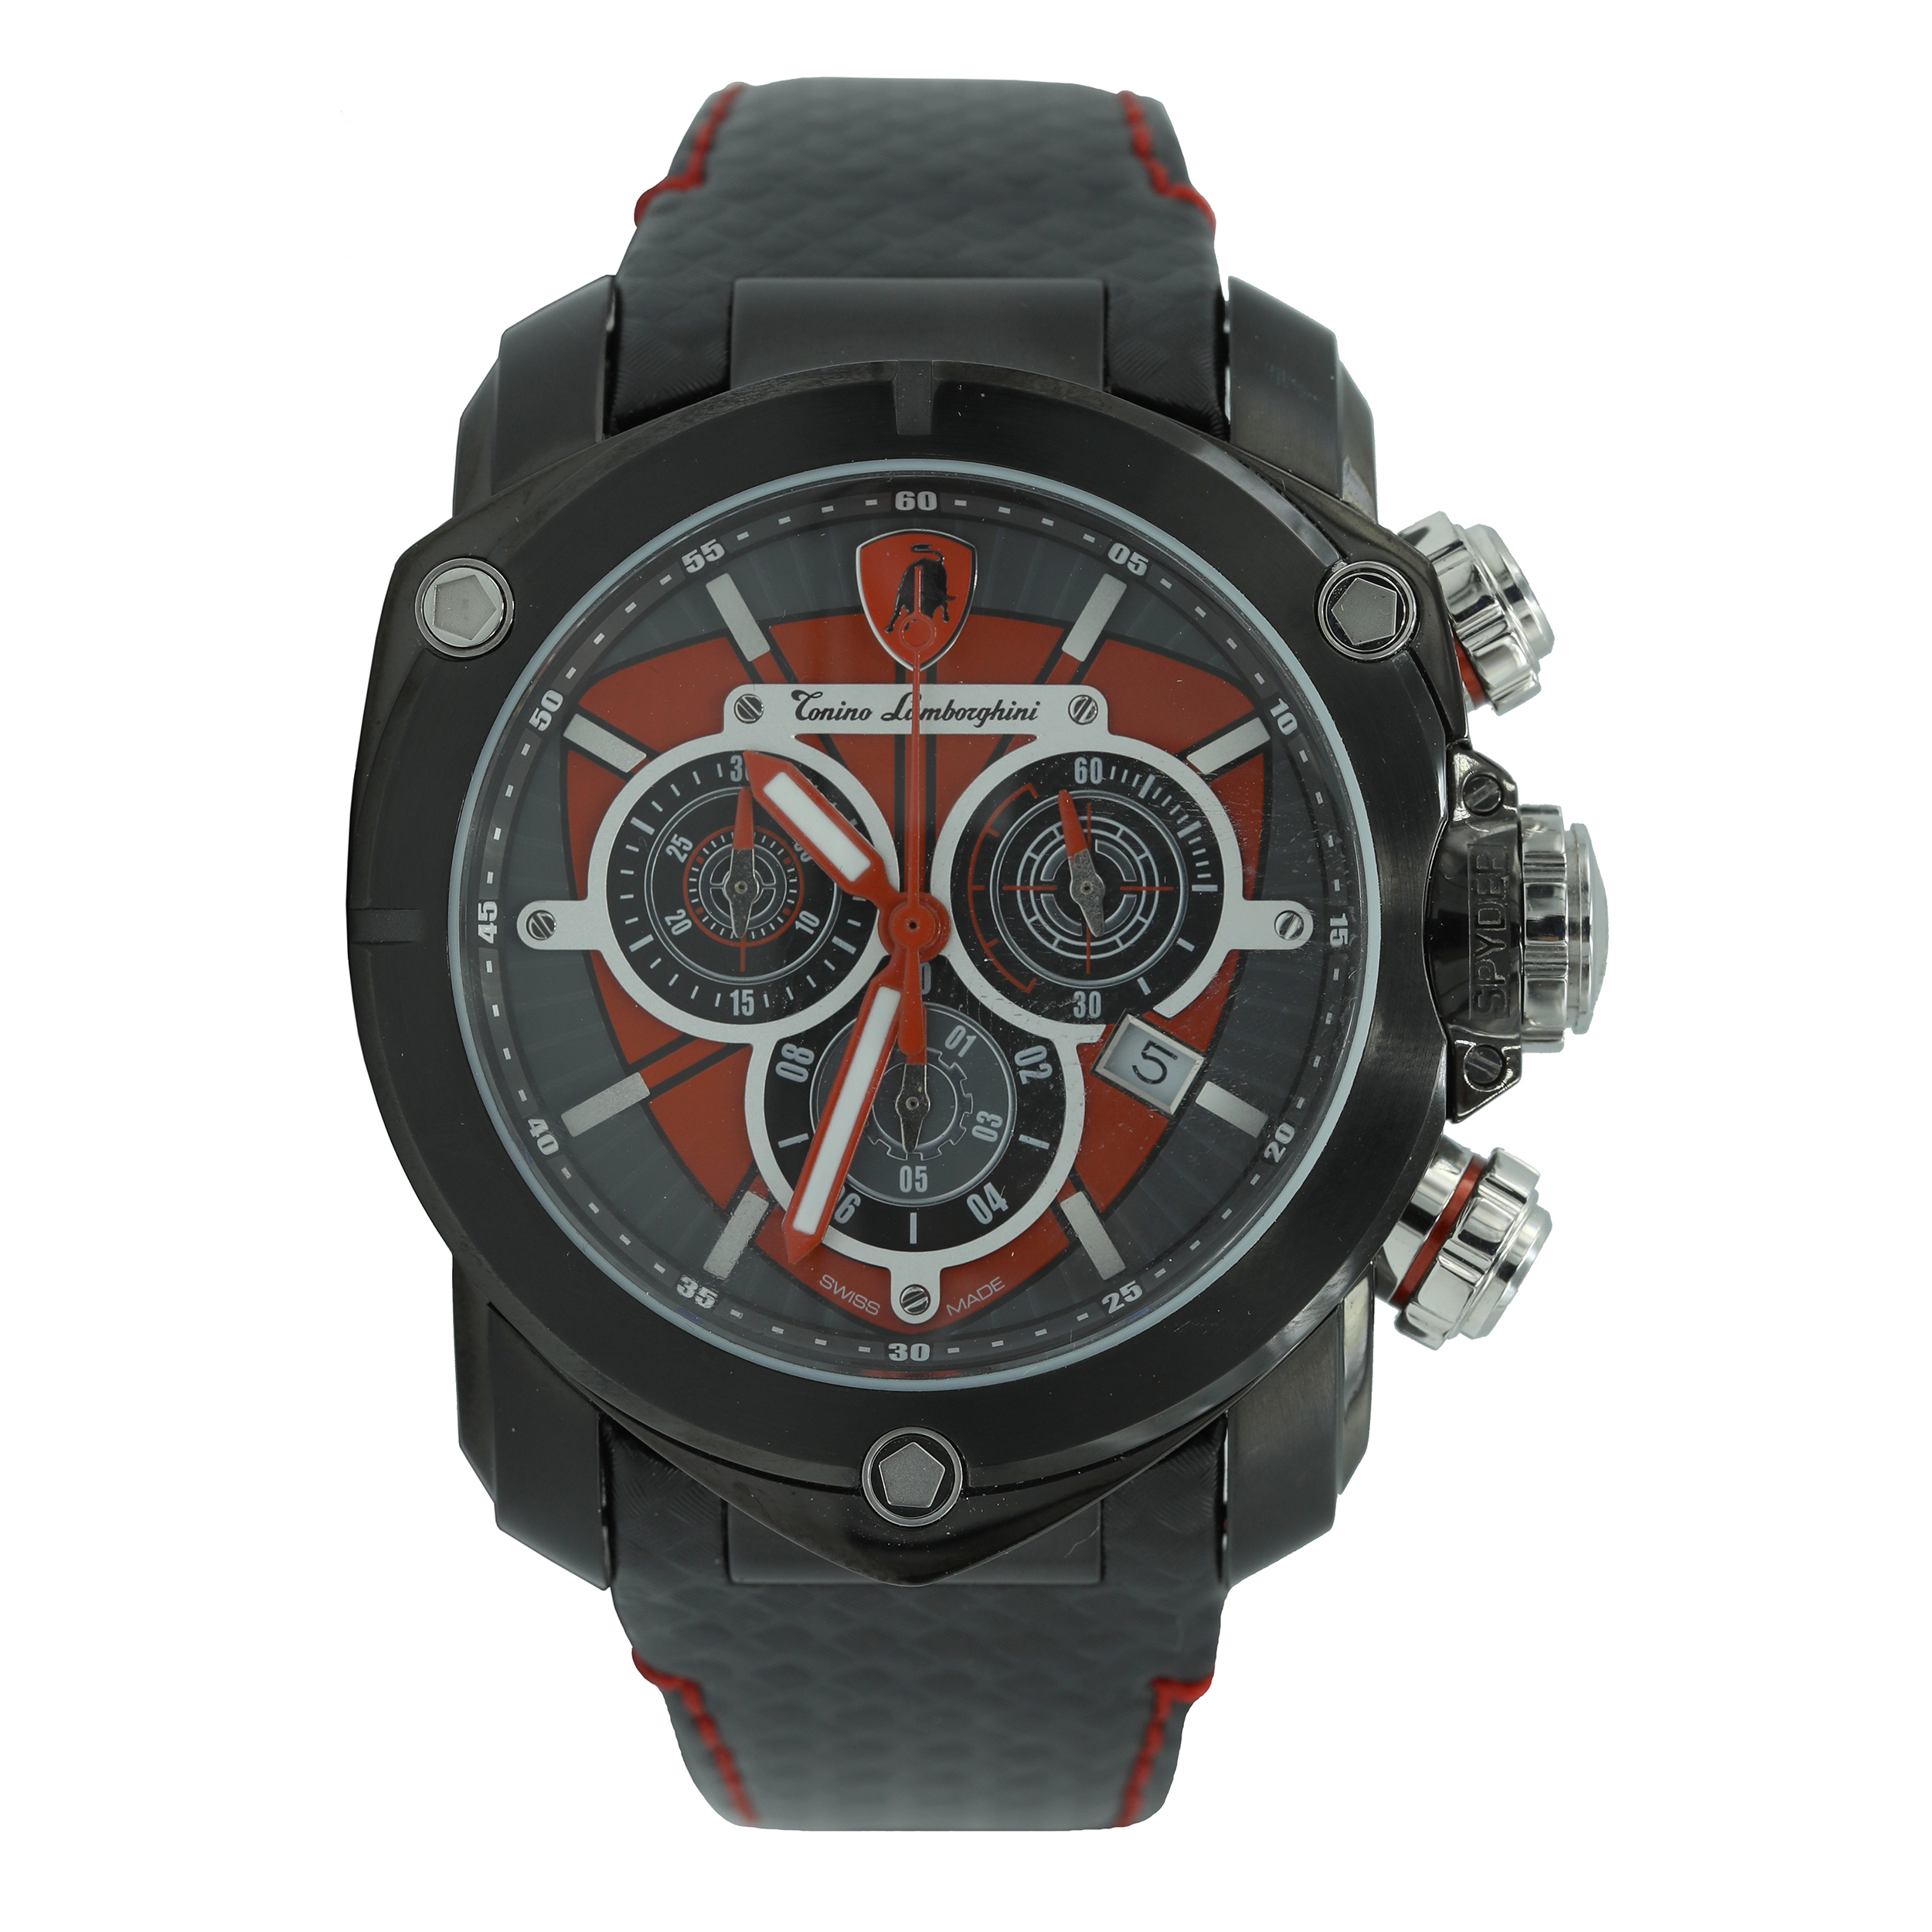 خرید ساعت مچی عقربه ای مردانه تونینو لامبورگینی مدل SPYDER 3202